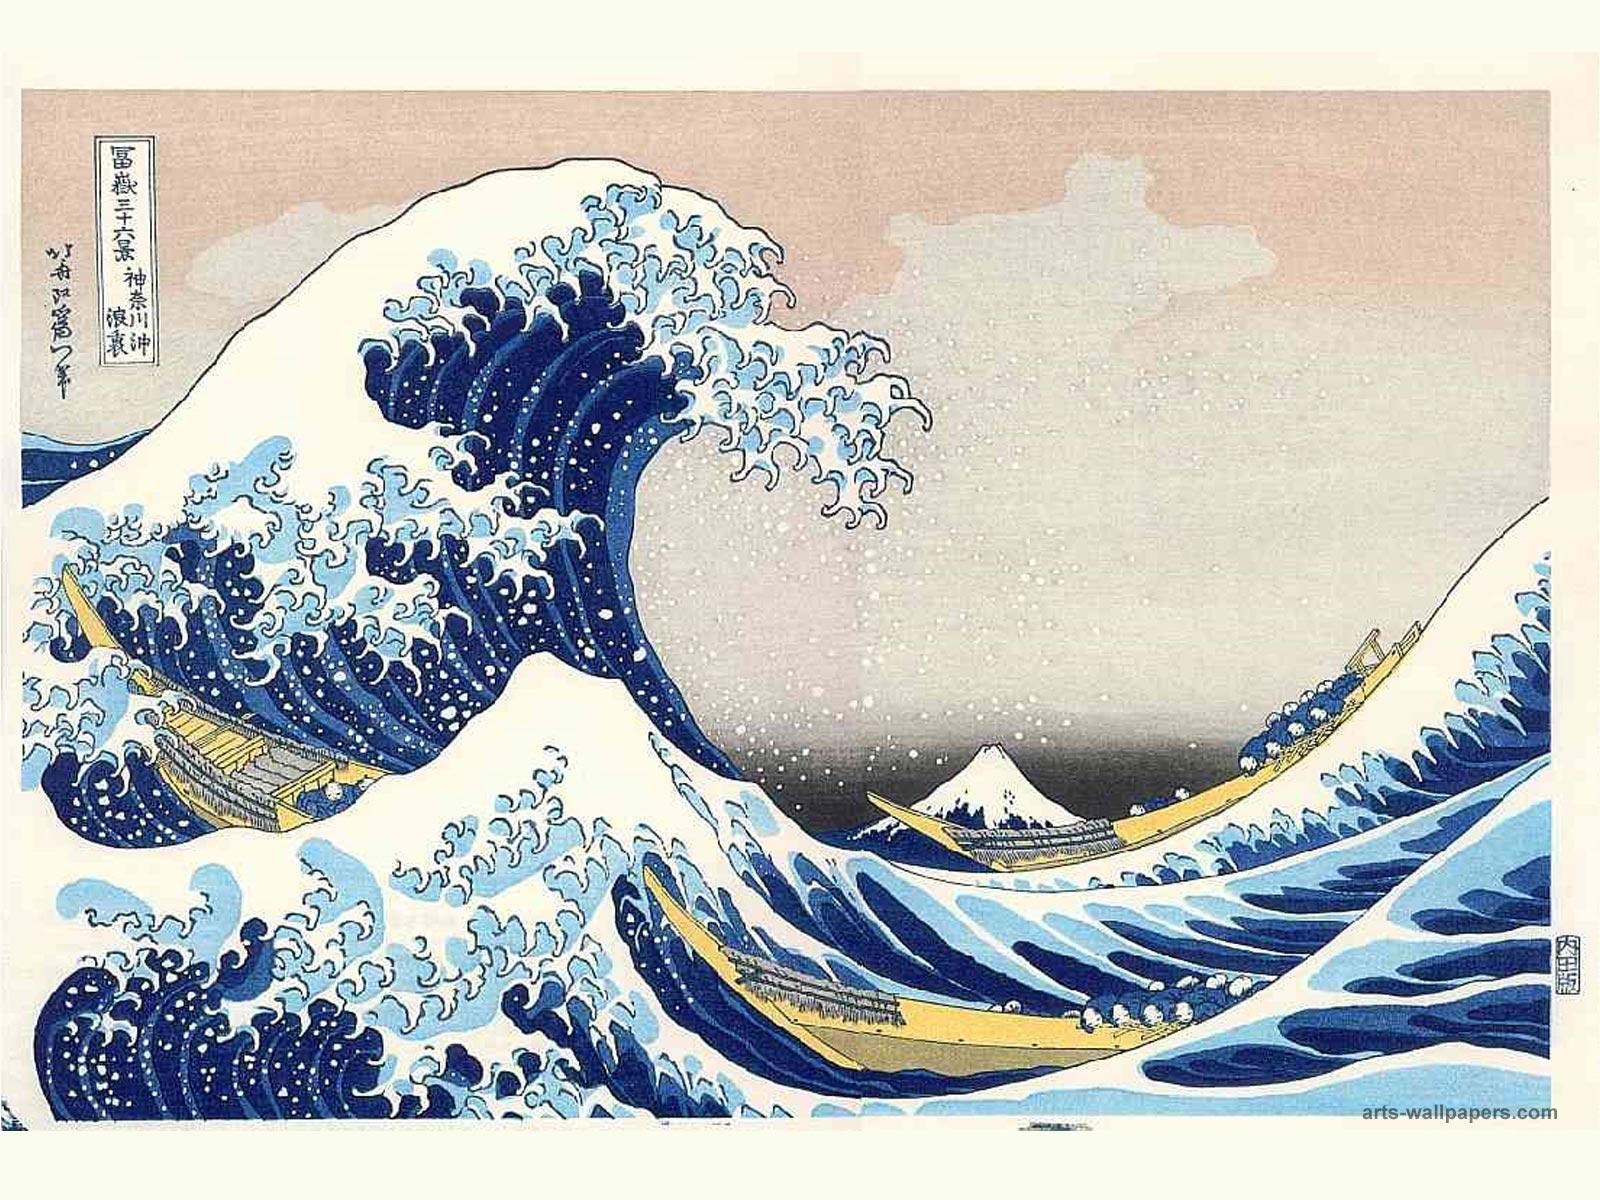 Japanese Woodblock Art Print Japanese Woodblock Art Wallpapers 1600x1200